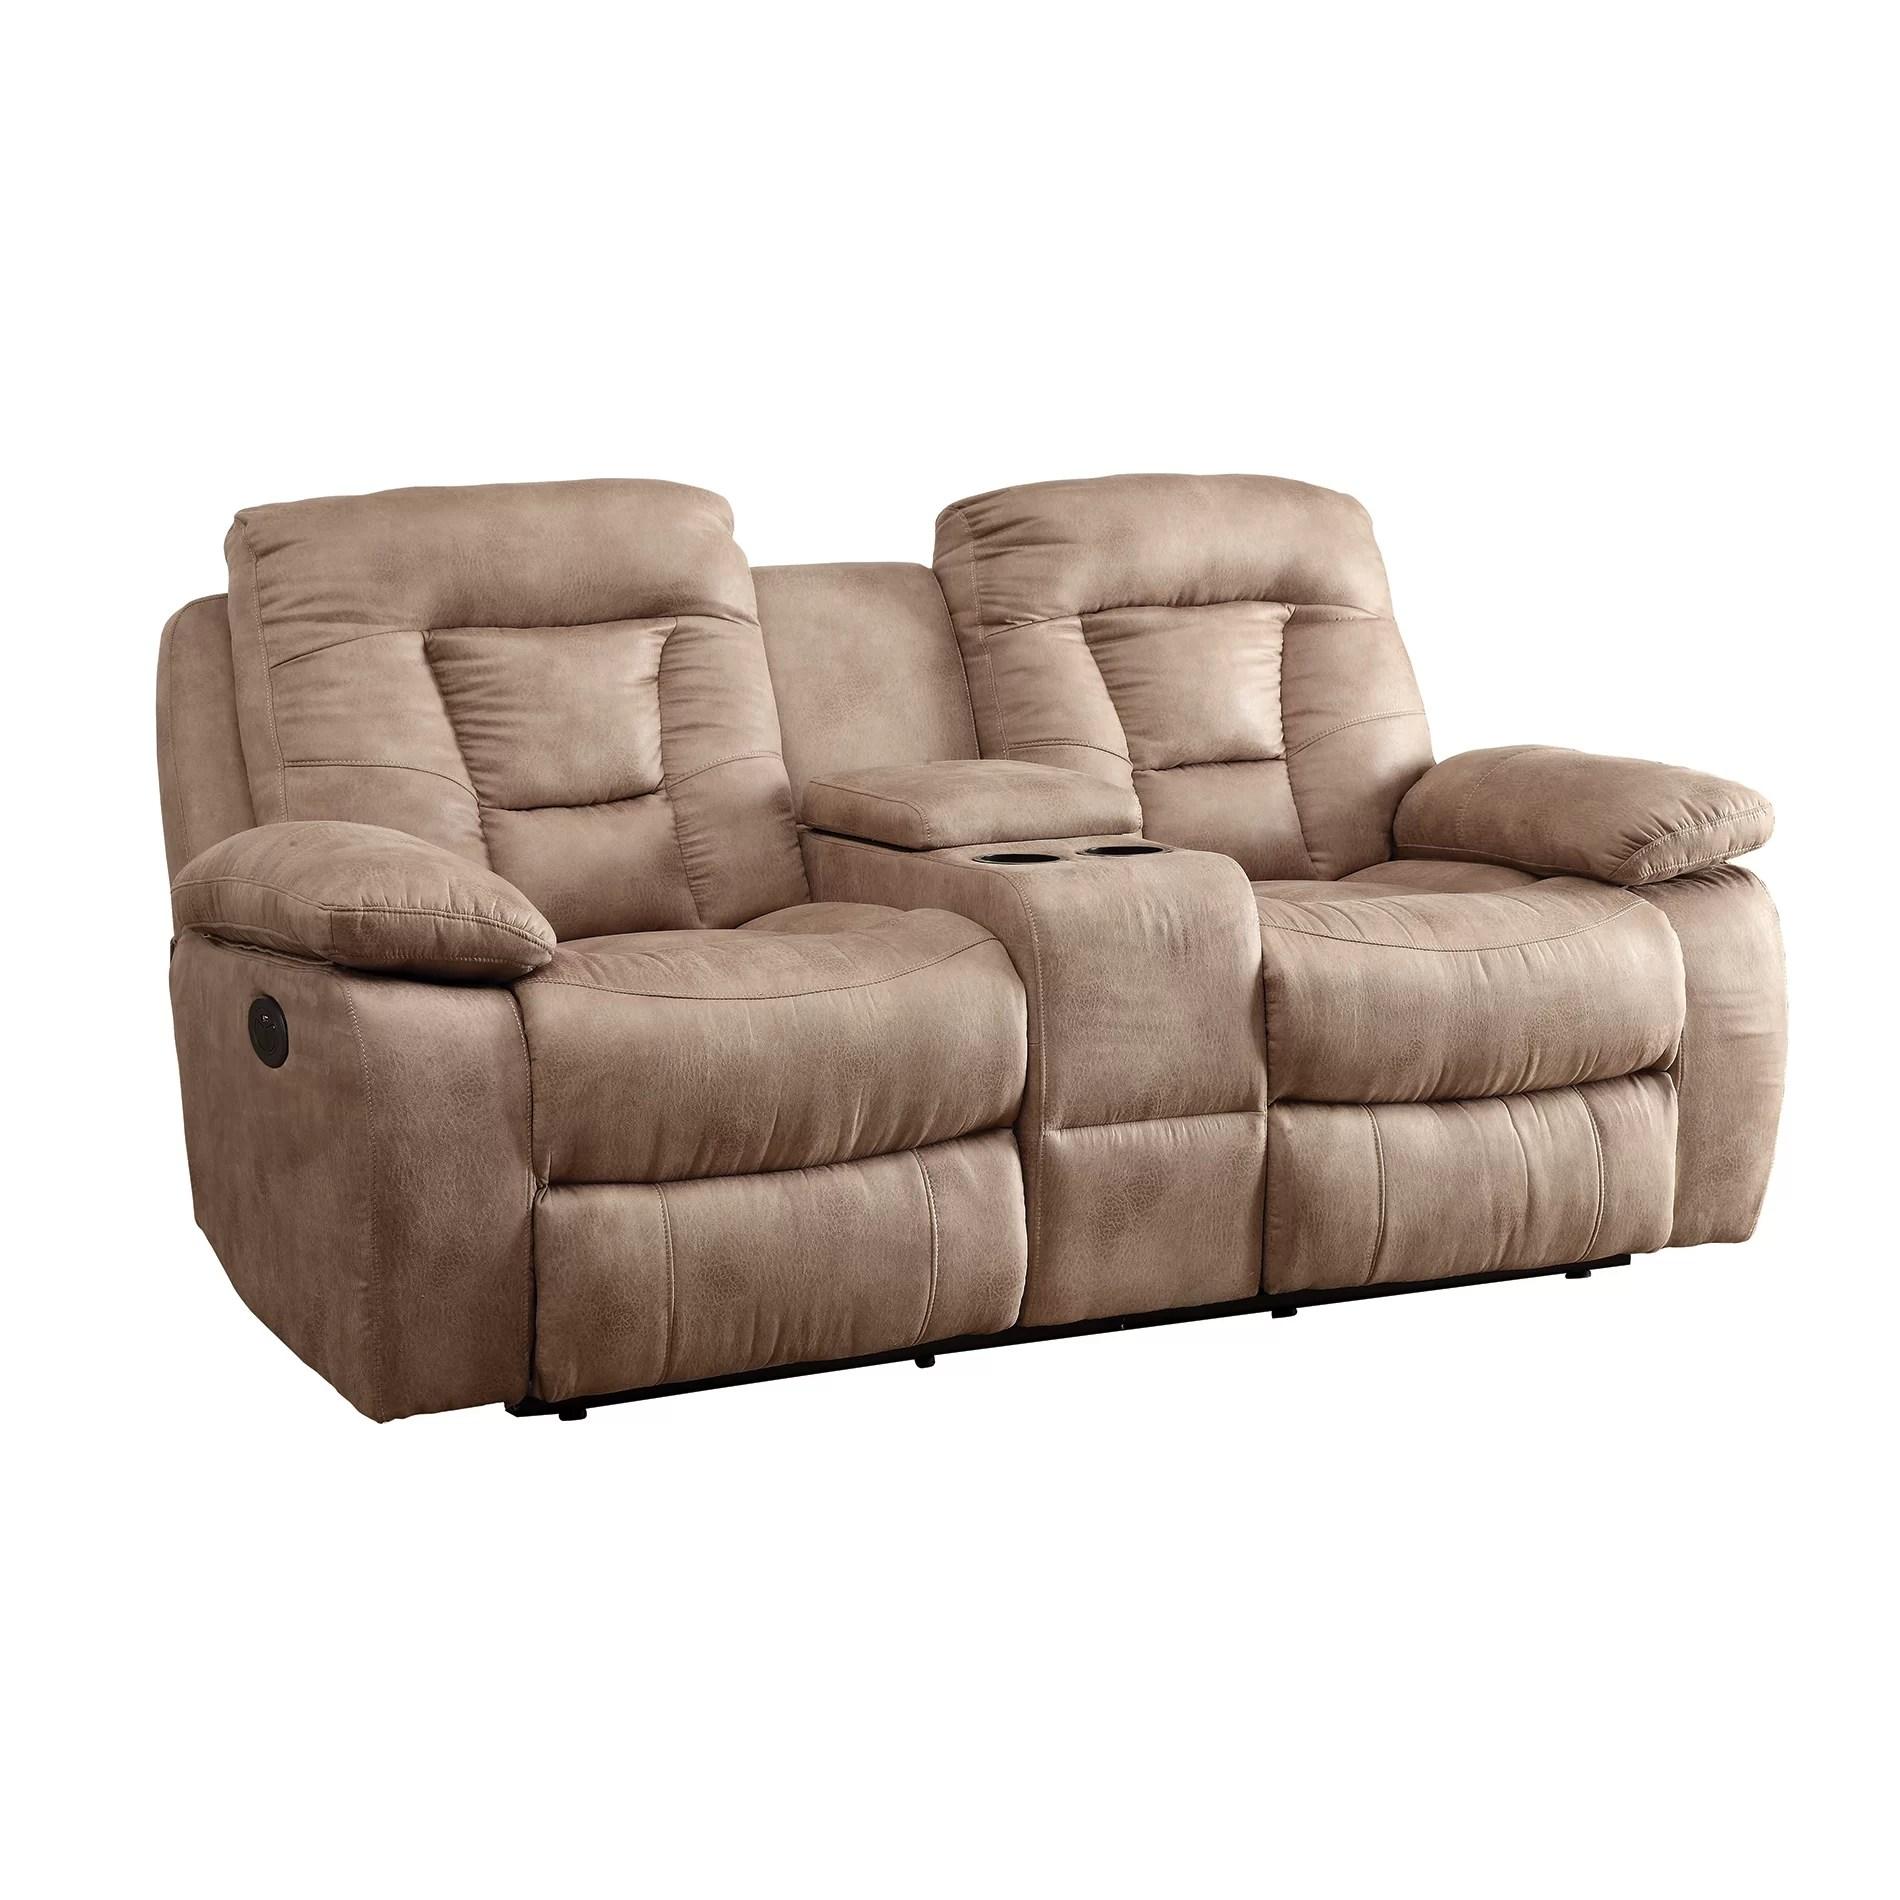 motion sofas gingham sofa bed wildon home  reclining loveseat wayfair ca